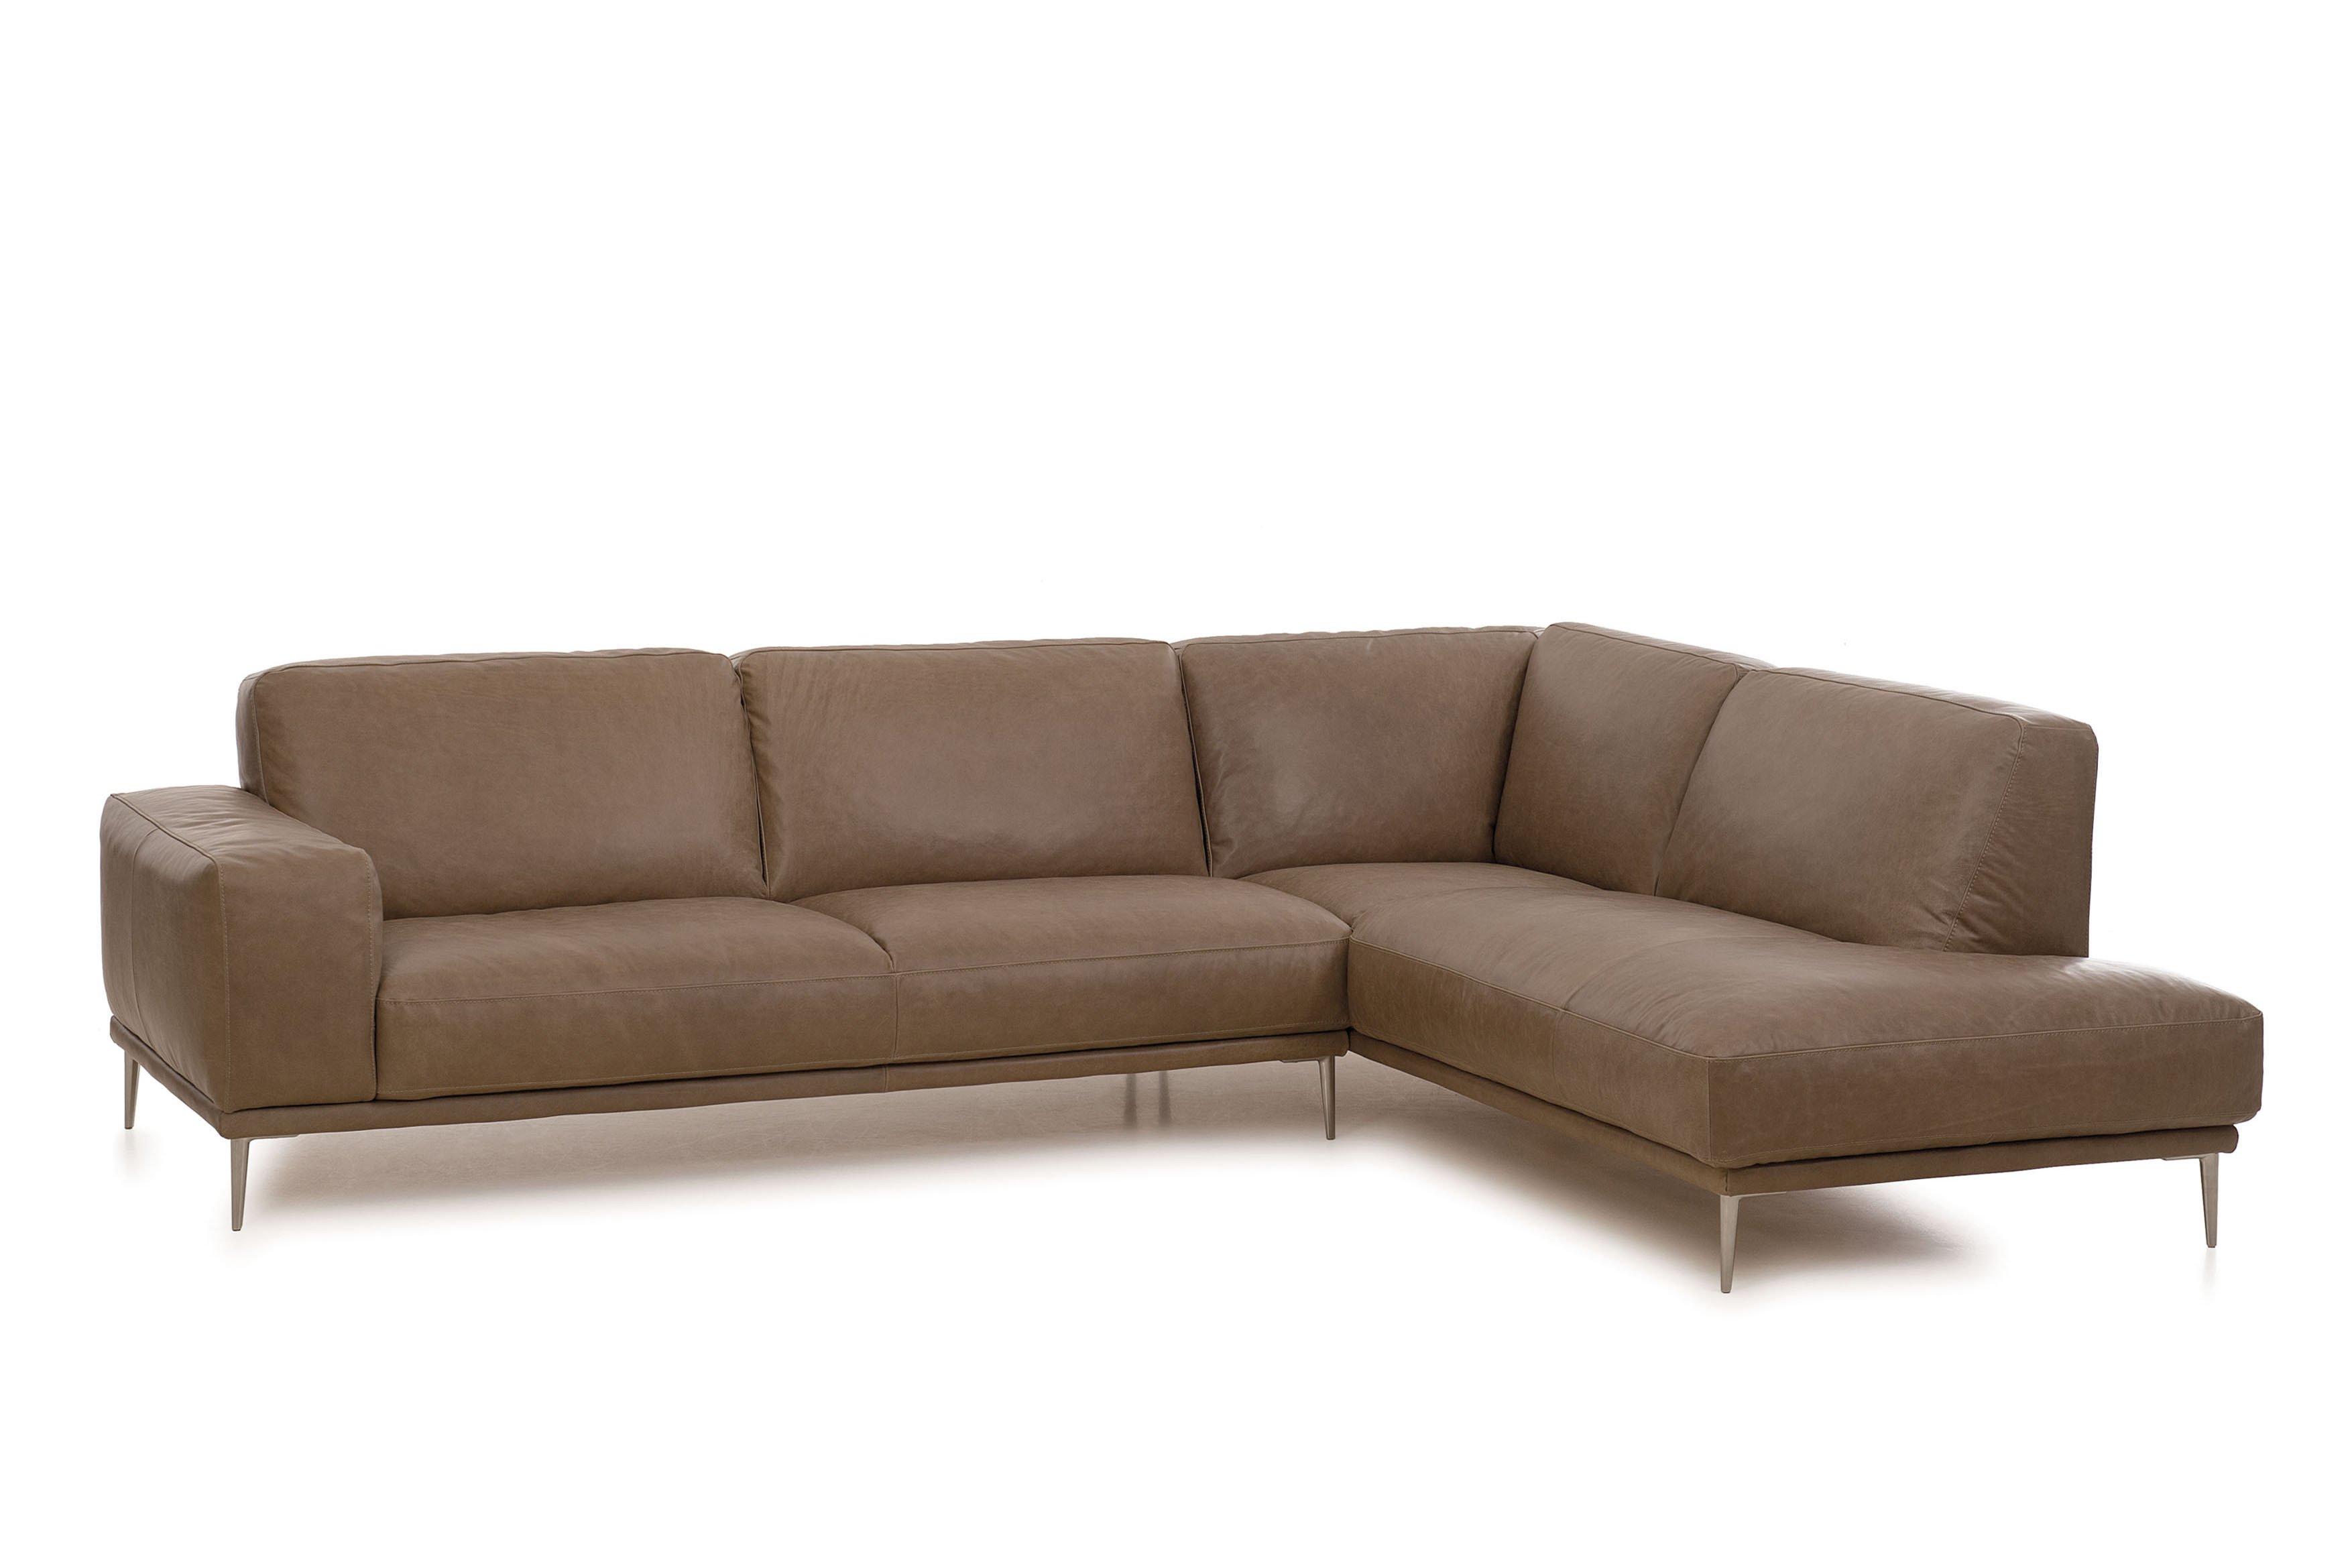 het anker linas eckgarnitur braun m bel letz ihr. Black Bedroom Furniture Sets. Home Design Ideas